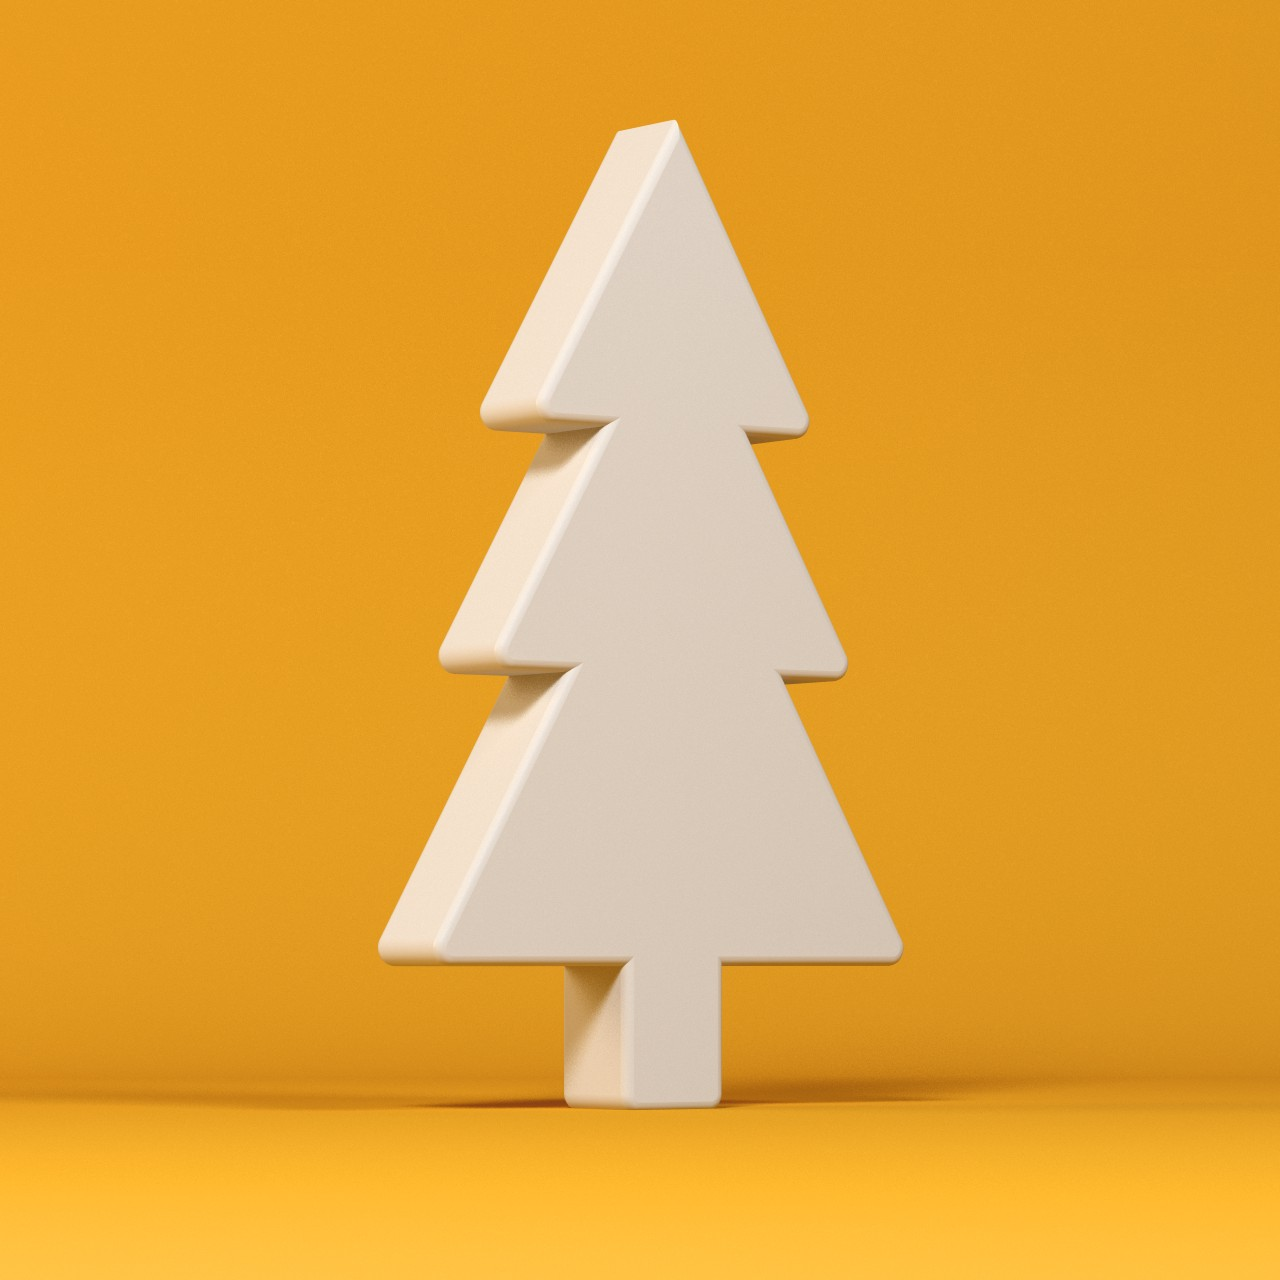 spline_tree_2_1.jpg